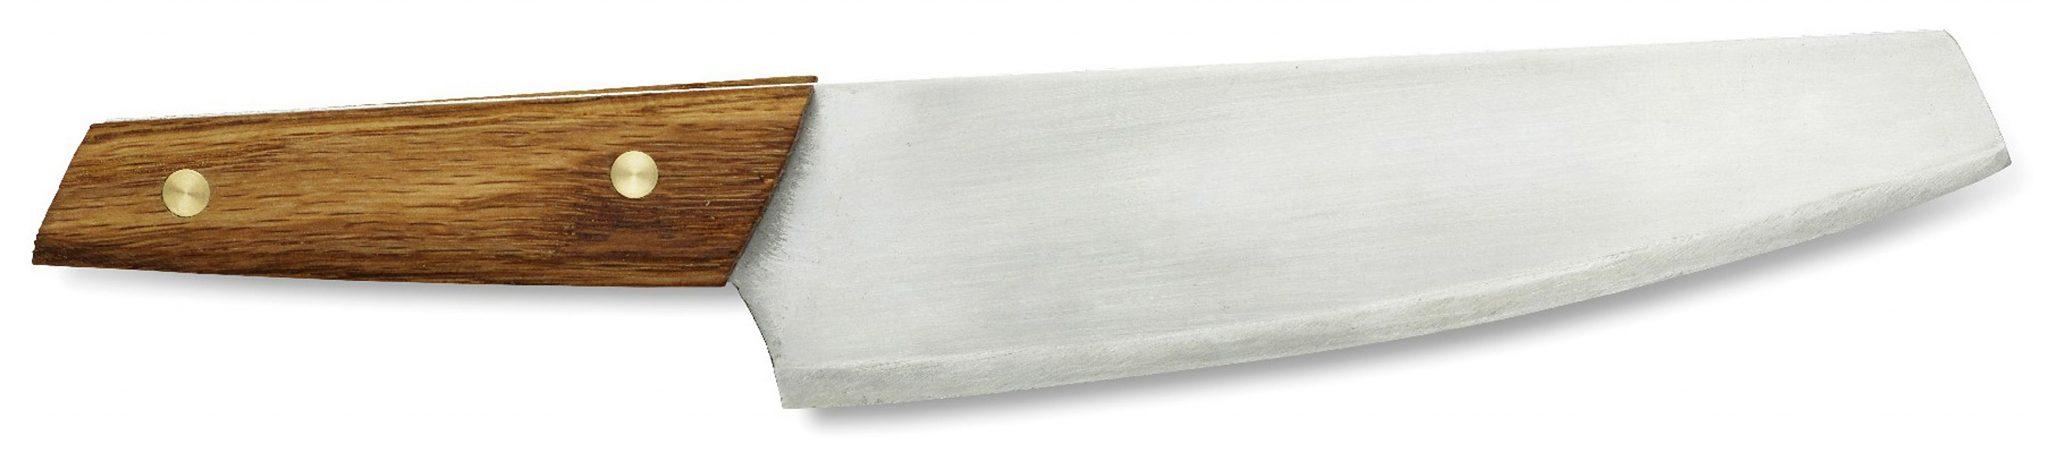 Primus Camping-Geschirr »CampFire Knife Large 15cm«